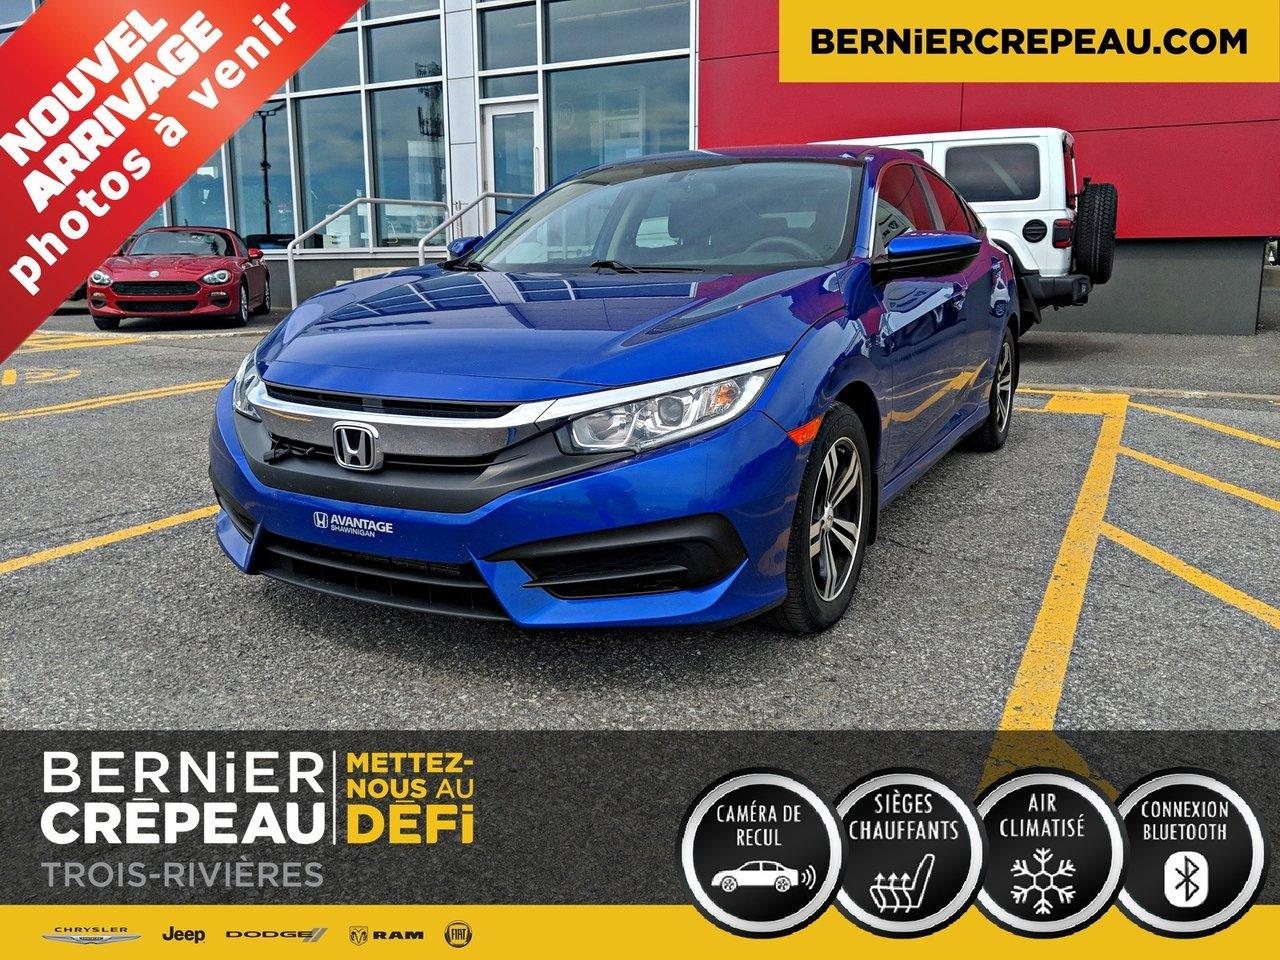 2016 Honda  Civic Sedan LX A/C CAMERA MAG BLUETOOTH